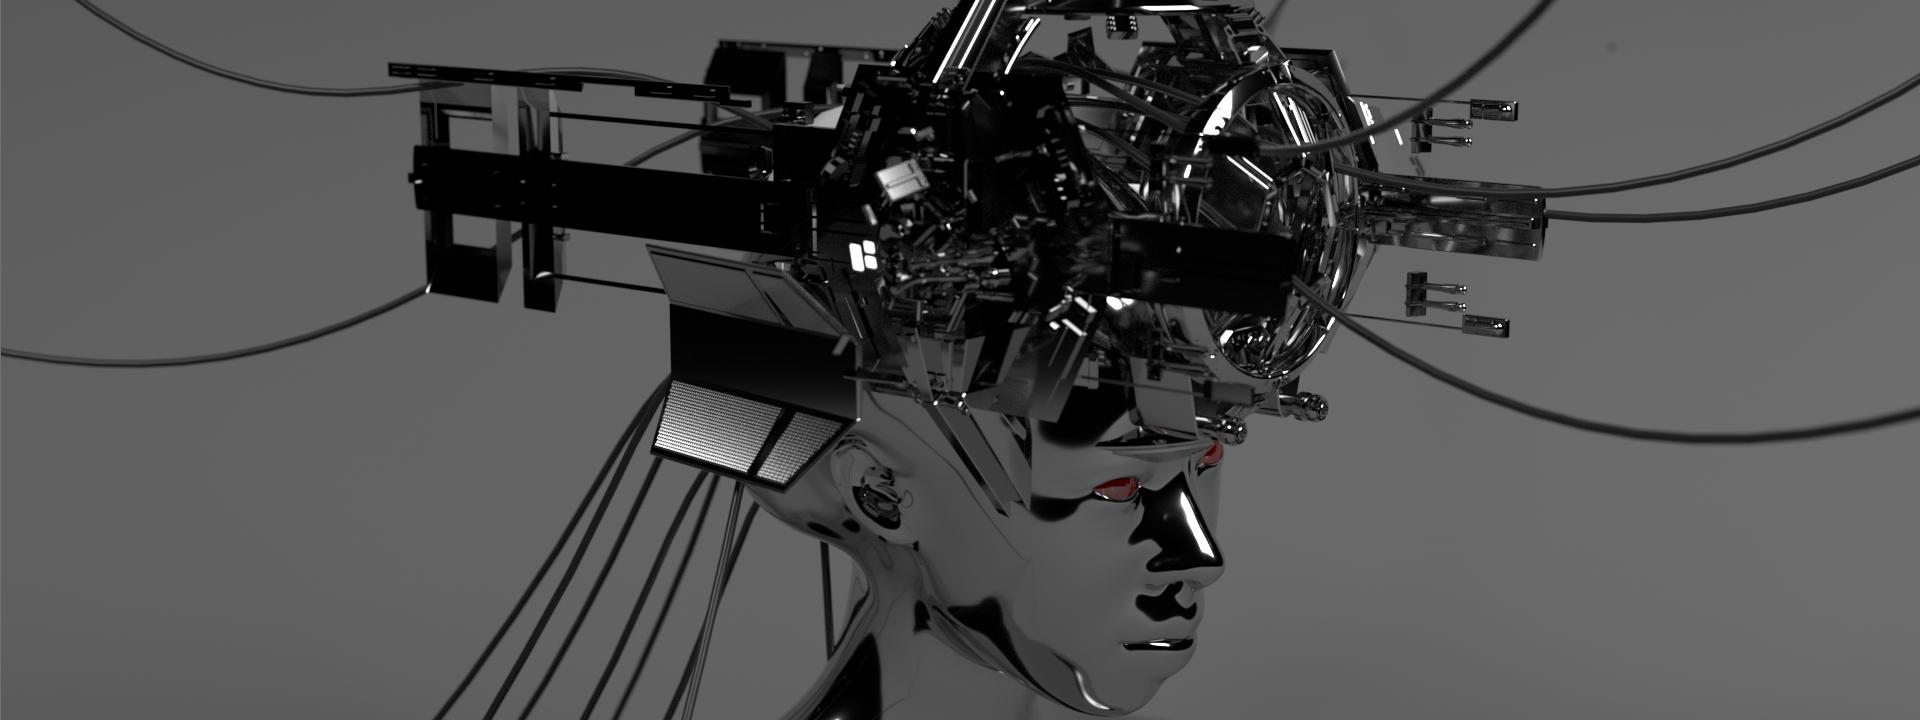 cyberpunk_pull-out0009.jpg